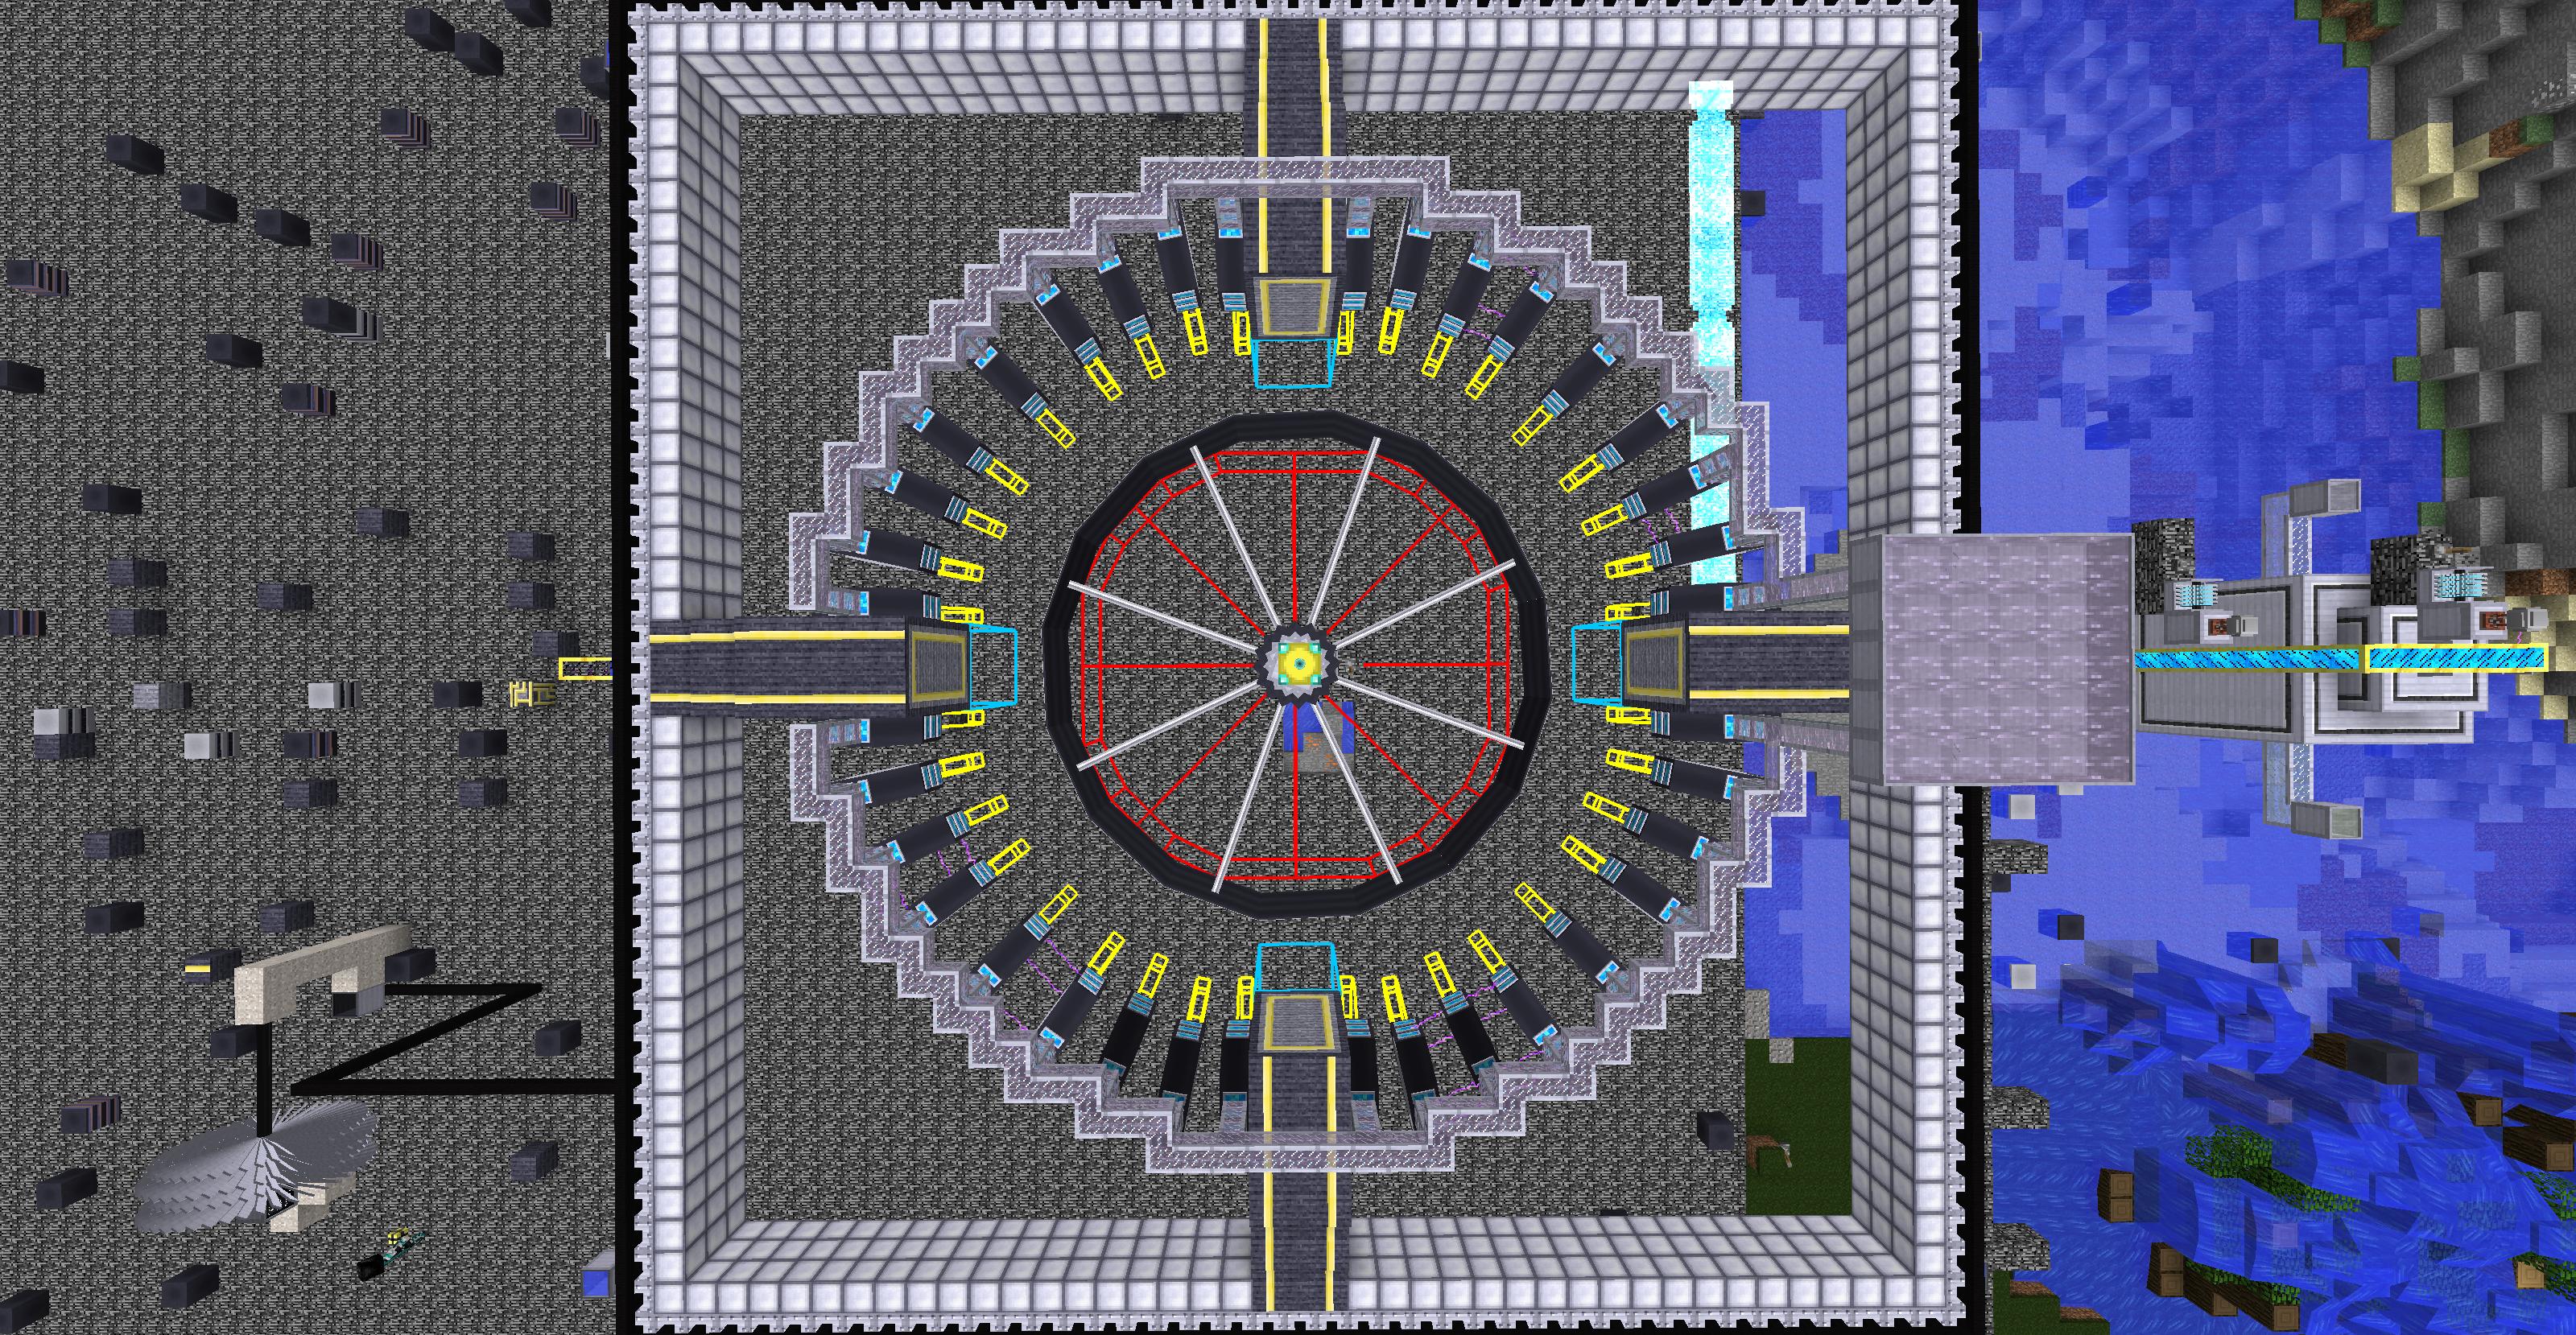 атомный реактор майнкрафт #7